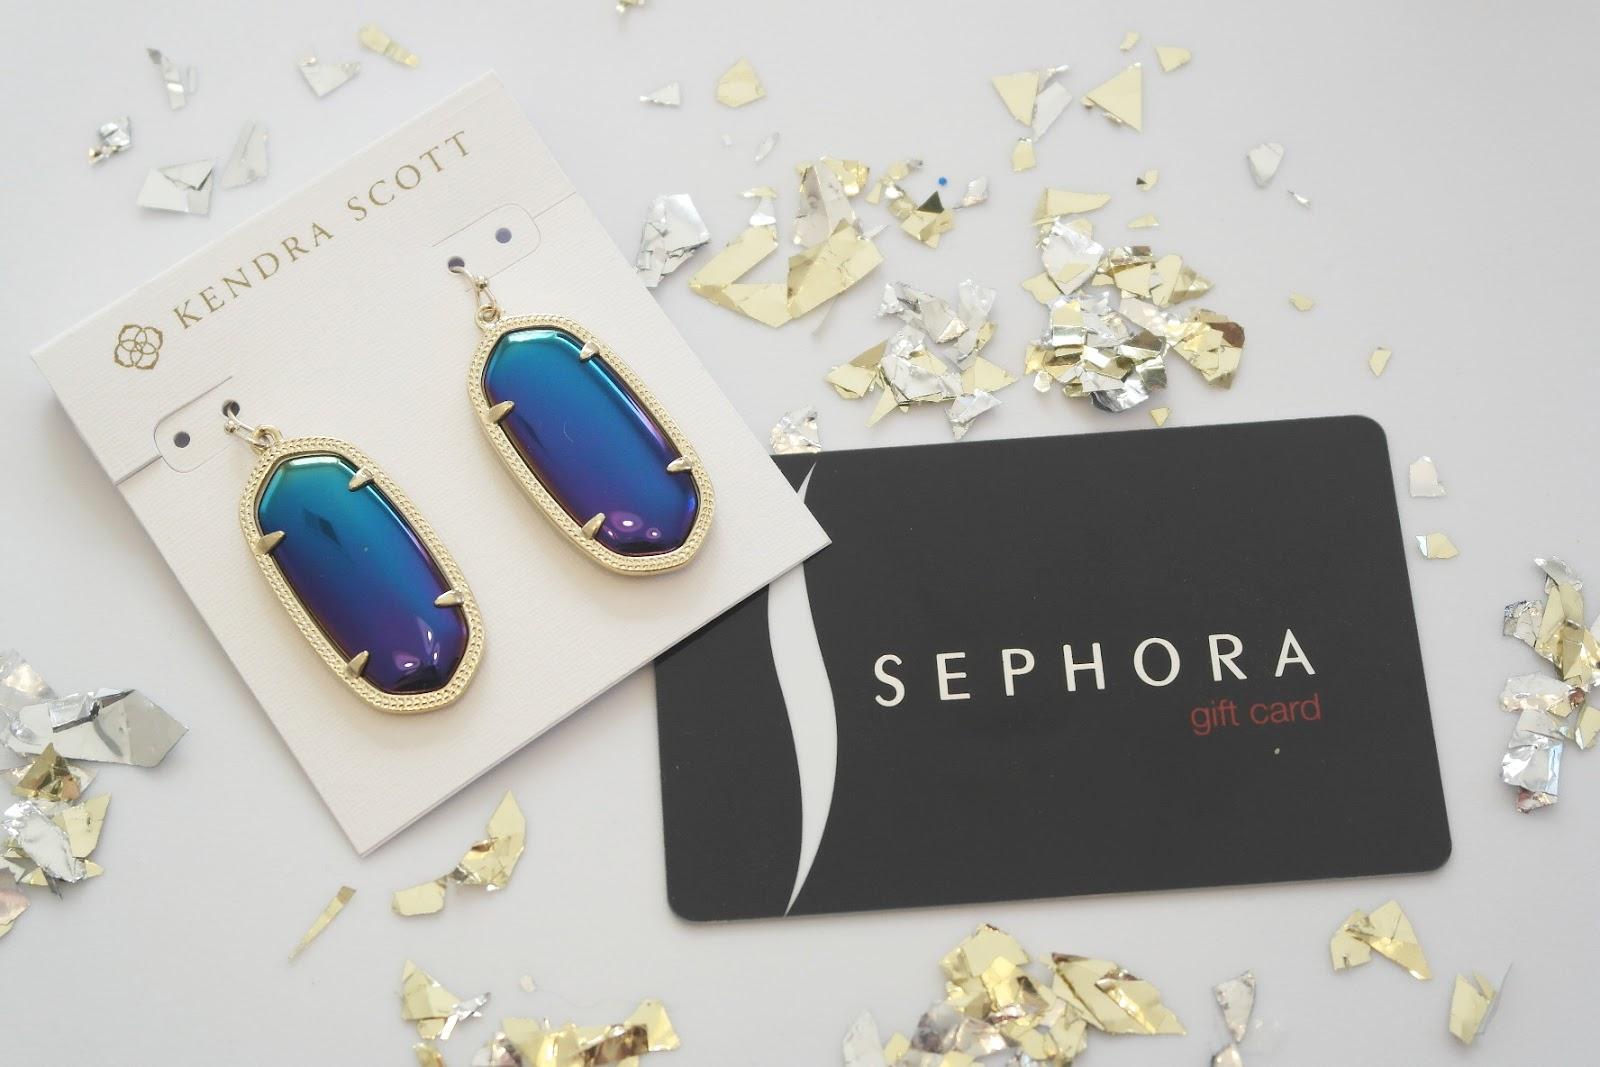 enter-to-win-sephora-giftcard